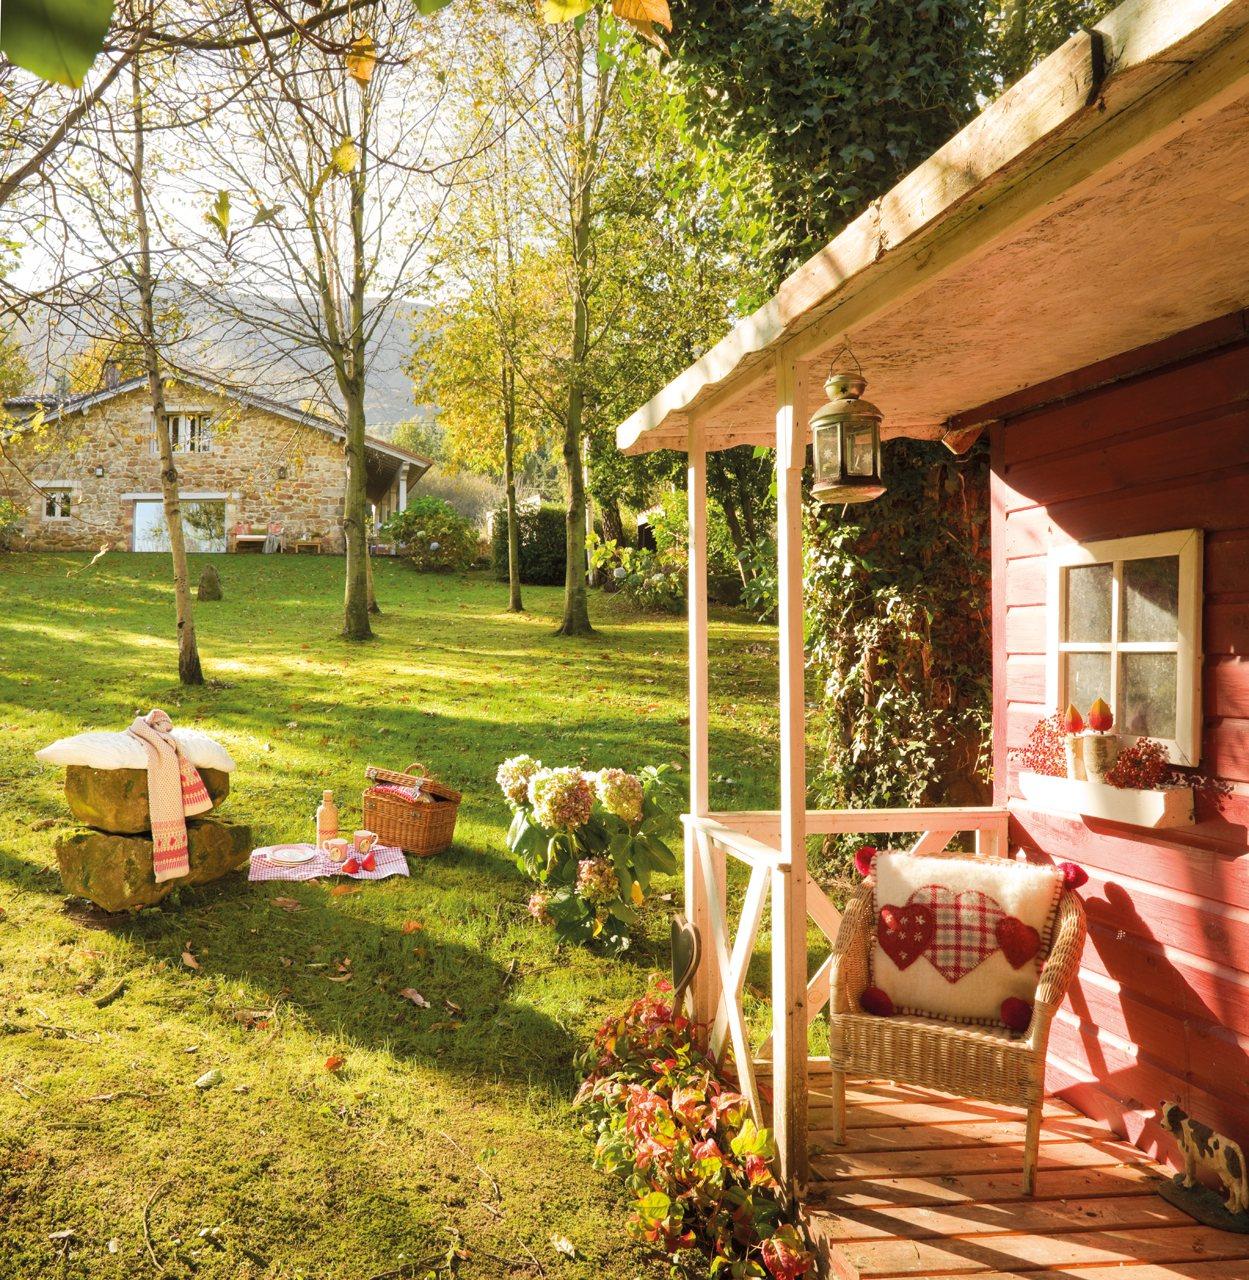 Vicky 39 s home una casa de cuento one story house for Casa de madera con jardin